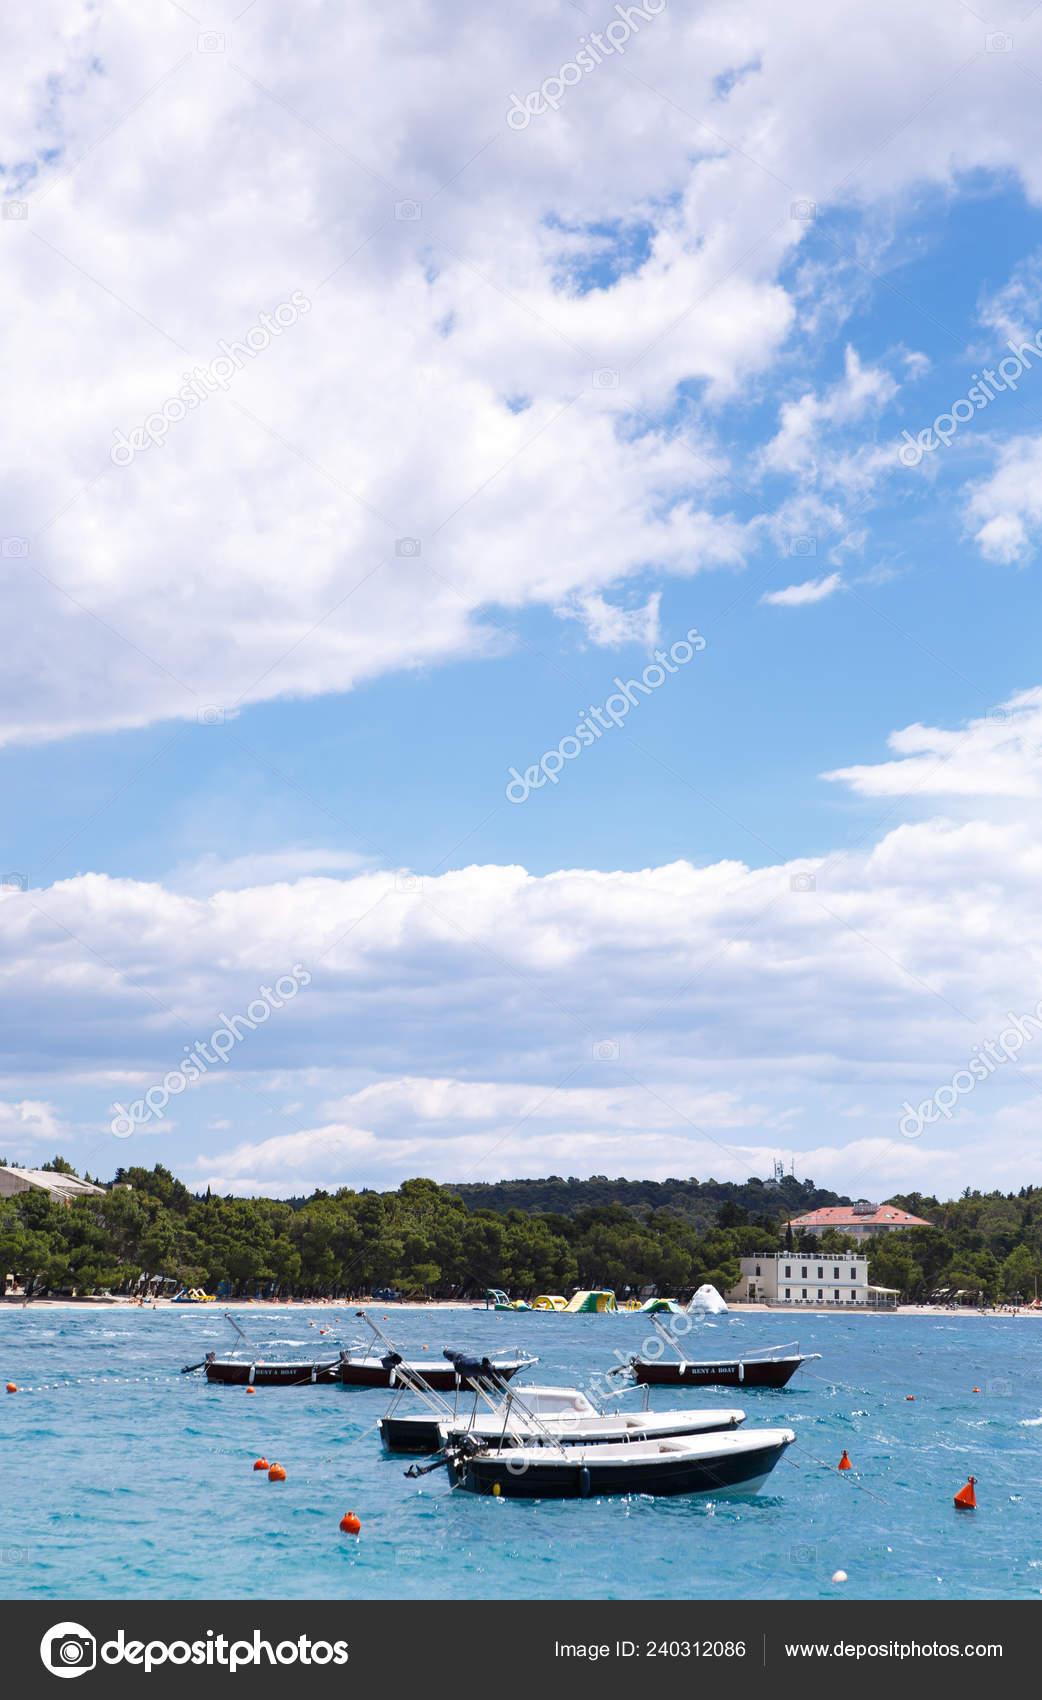 Rental Motor Boats Drift Waves Beautiful Adriatic Sea